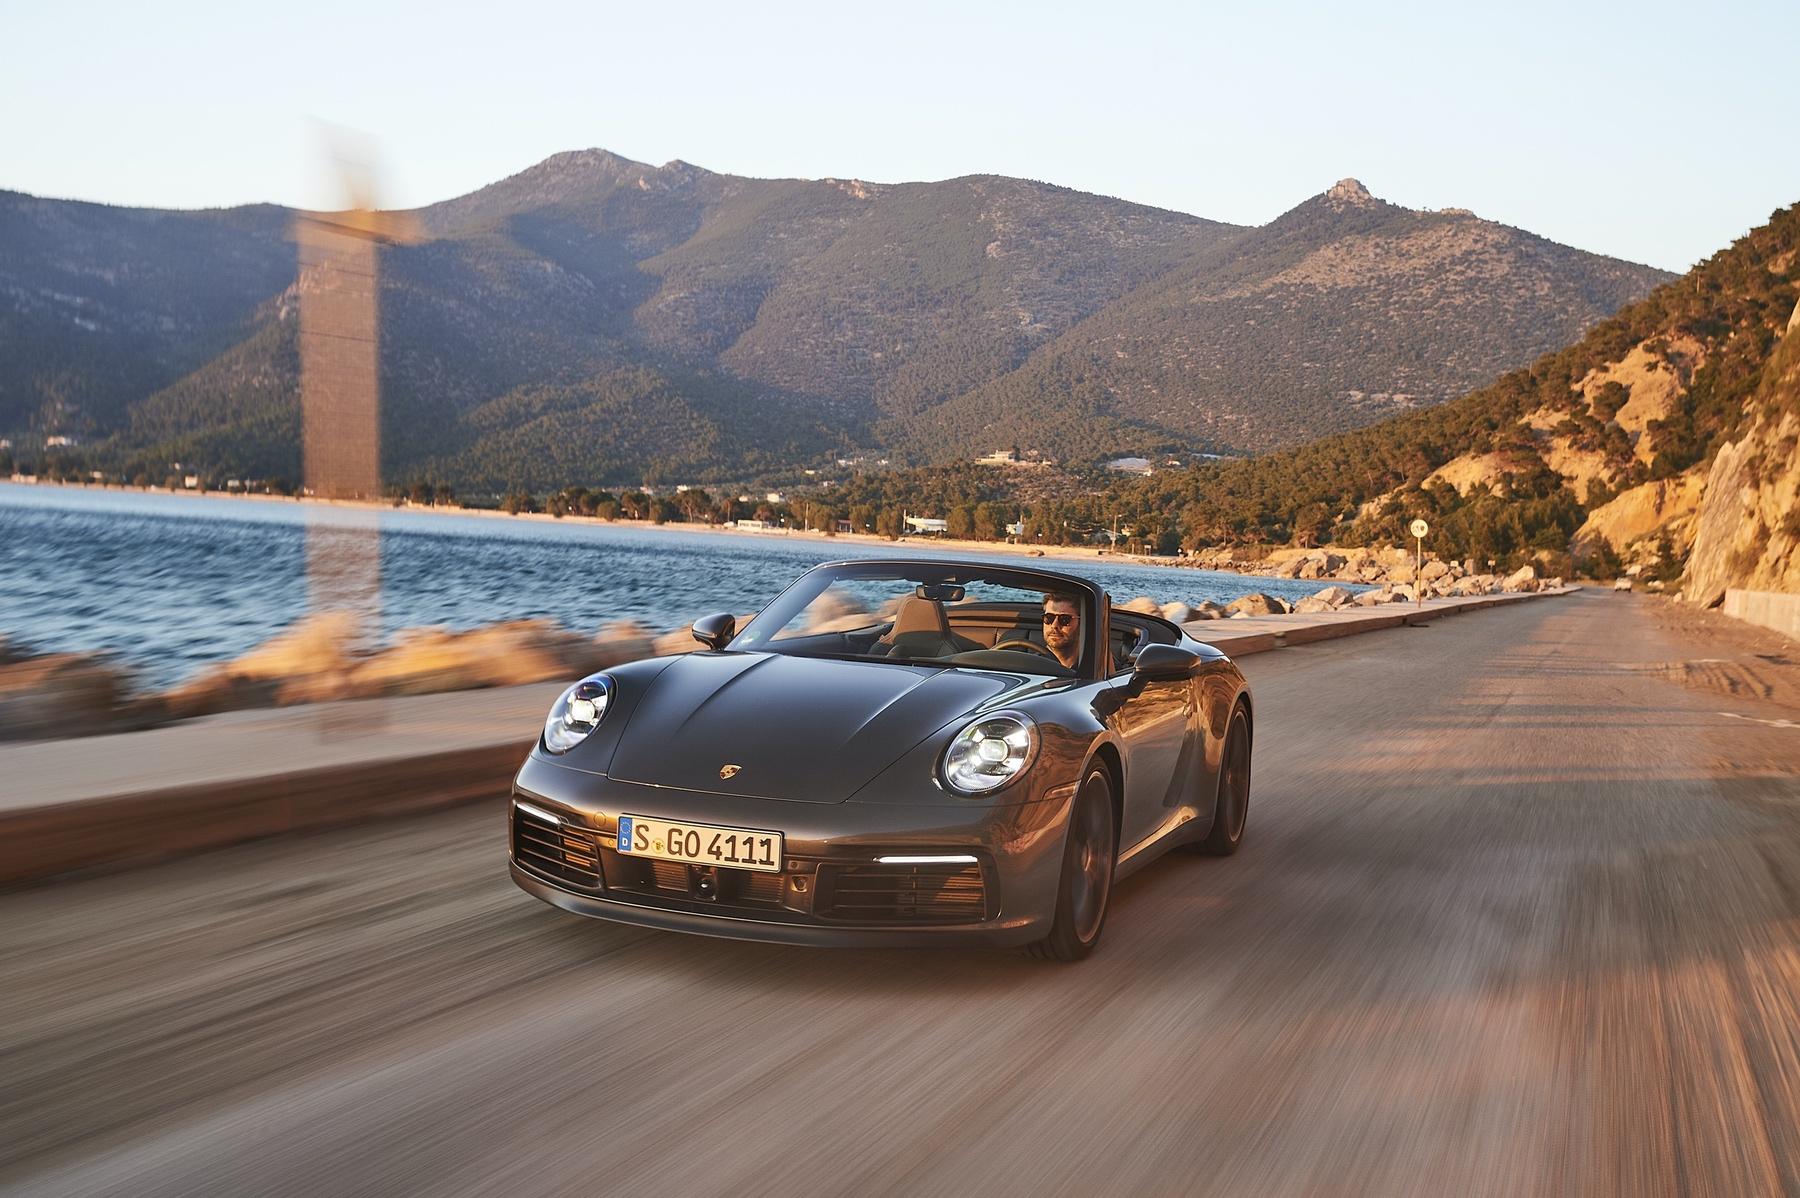 Test_Drive_Porsche_911_Athens_0043